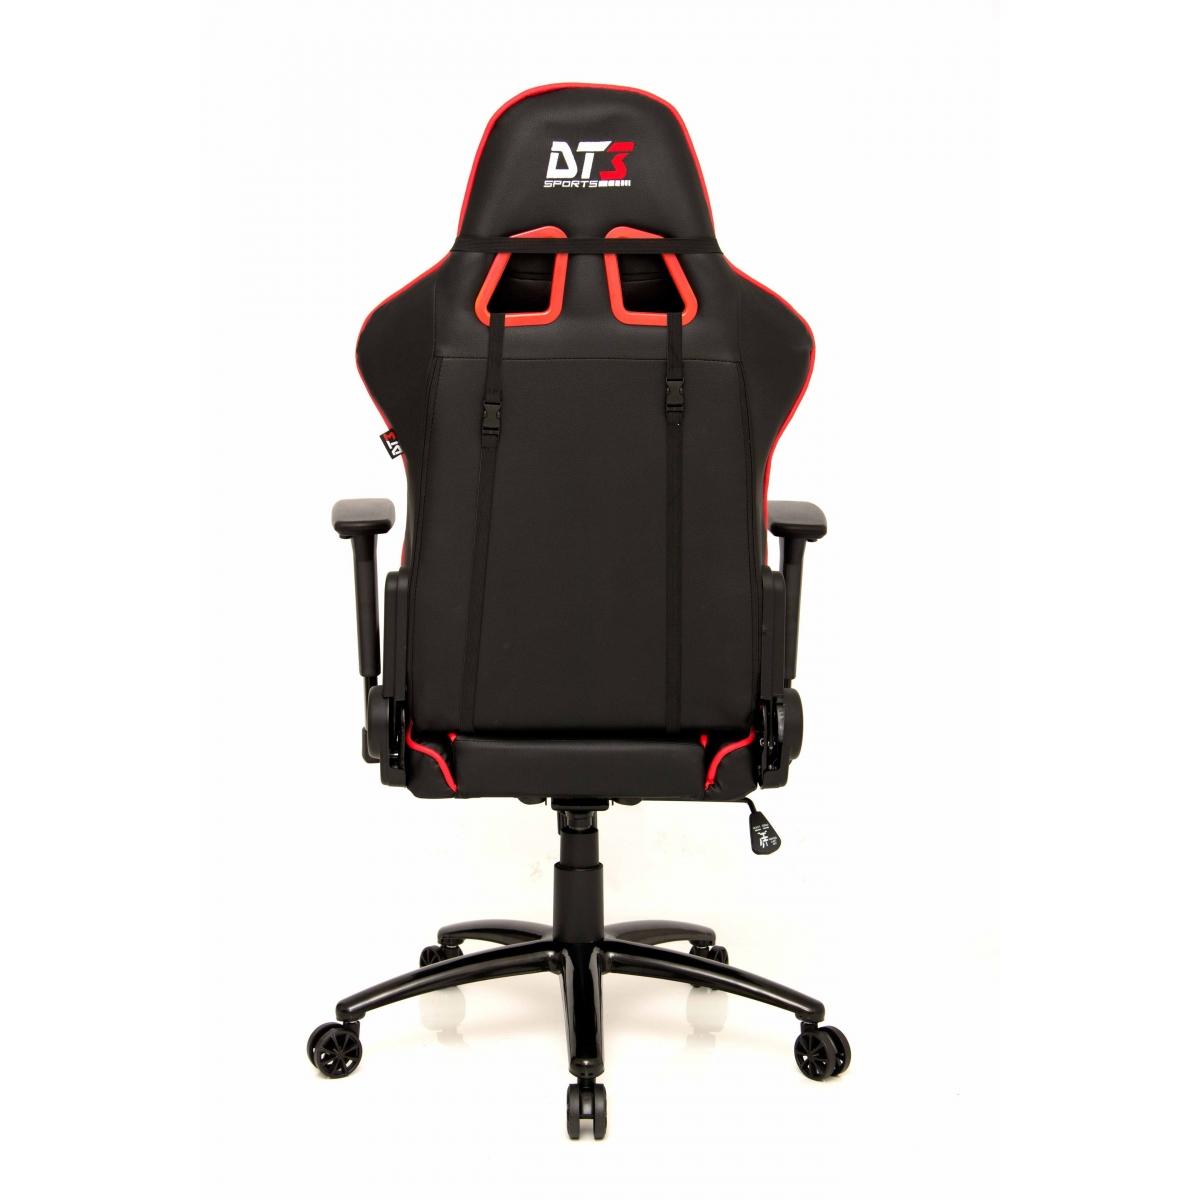 Cadeira Gamer DT3Sports Modena, Black-Red